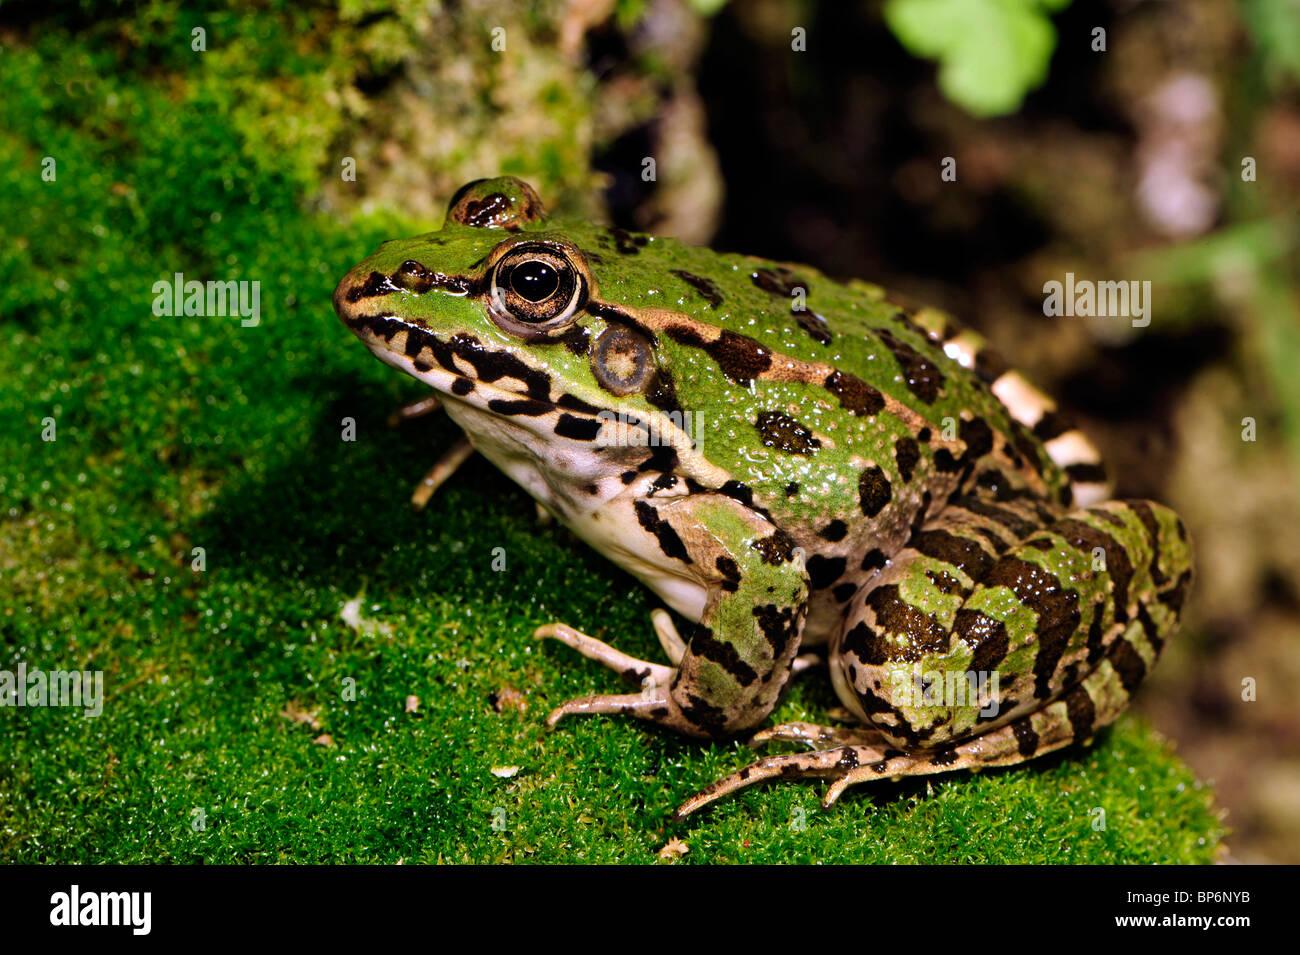 Greek March Frog (Pelophylax kurtmuelleri, Rana kurtmuelleri, Rana balcanica  ), sitting on moss, Greece, Peloponnes Stock Photo